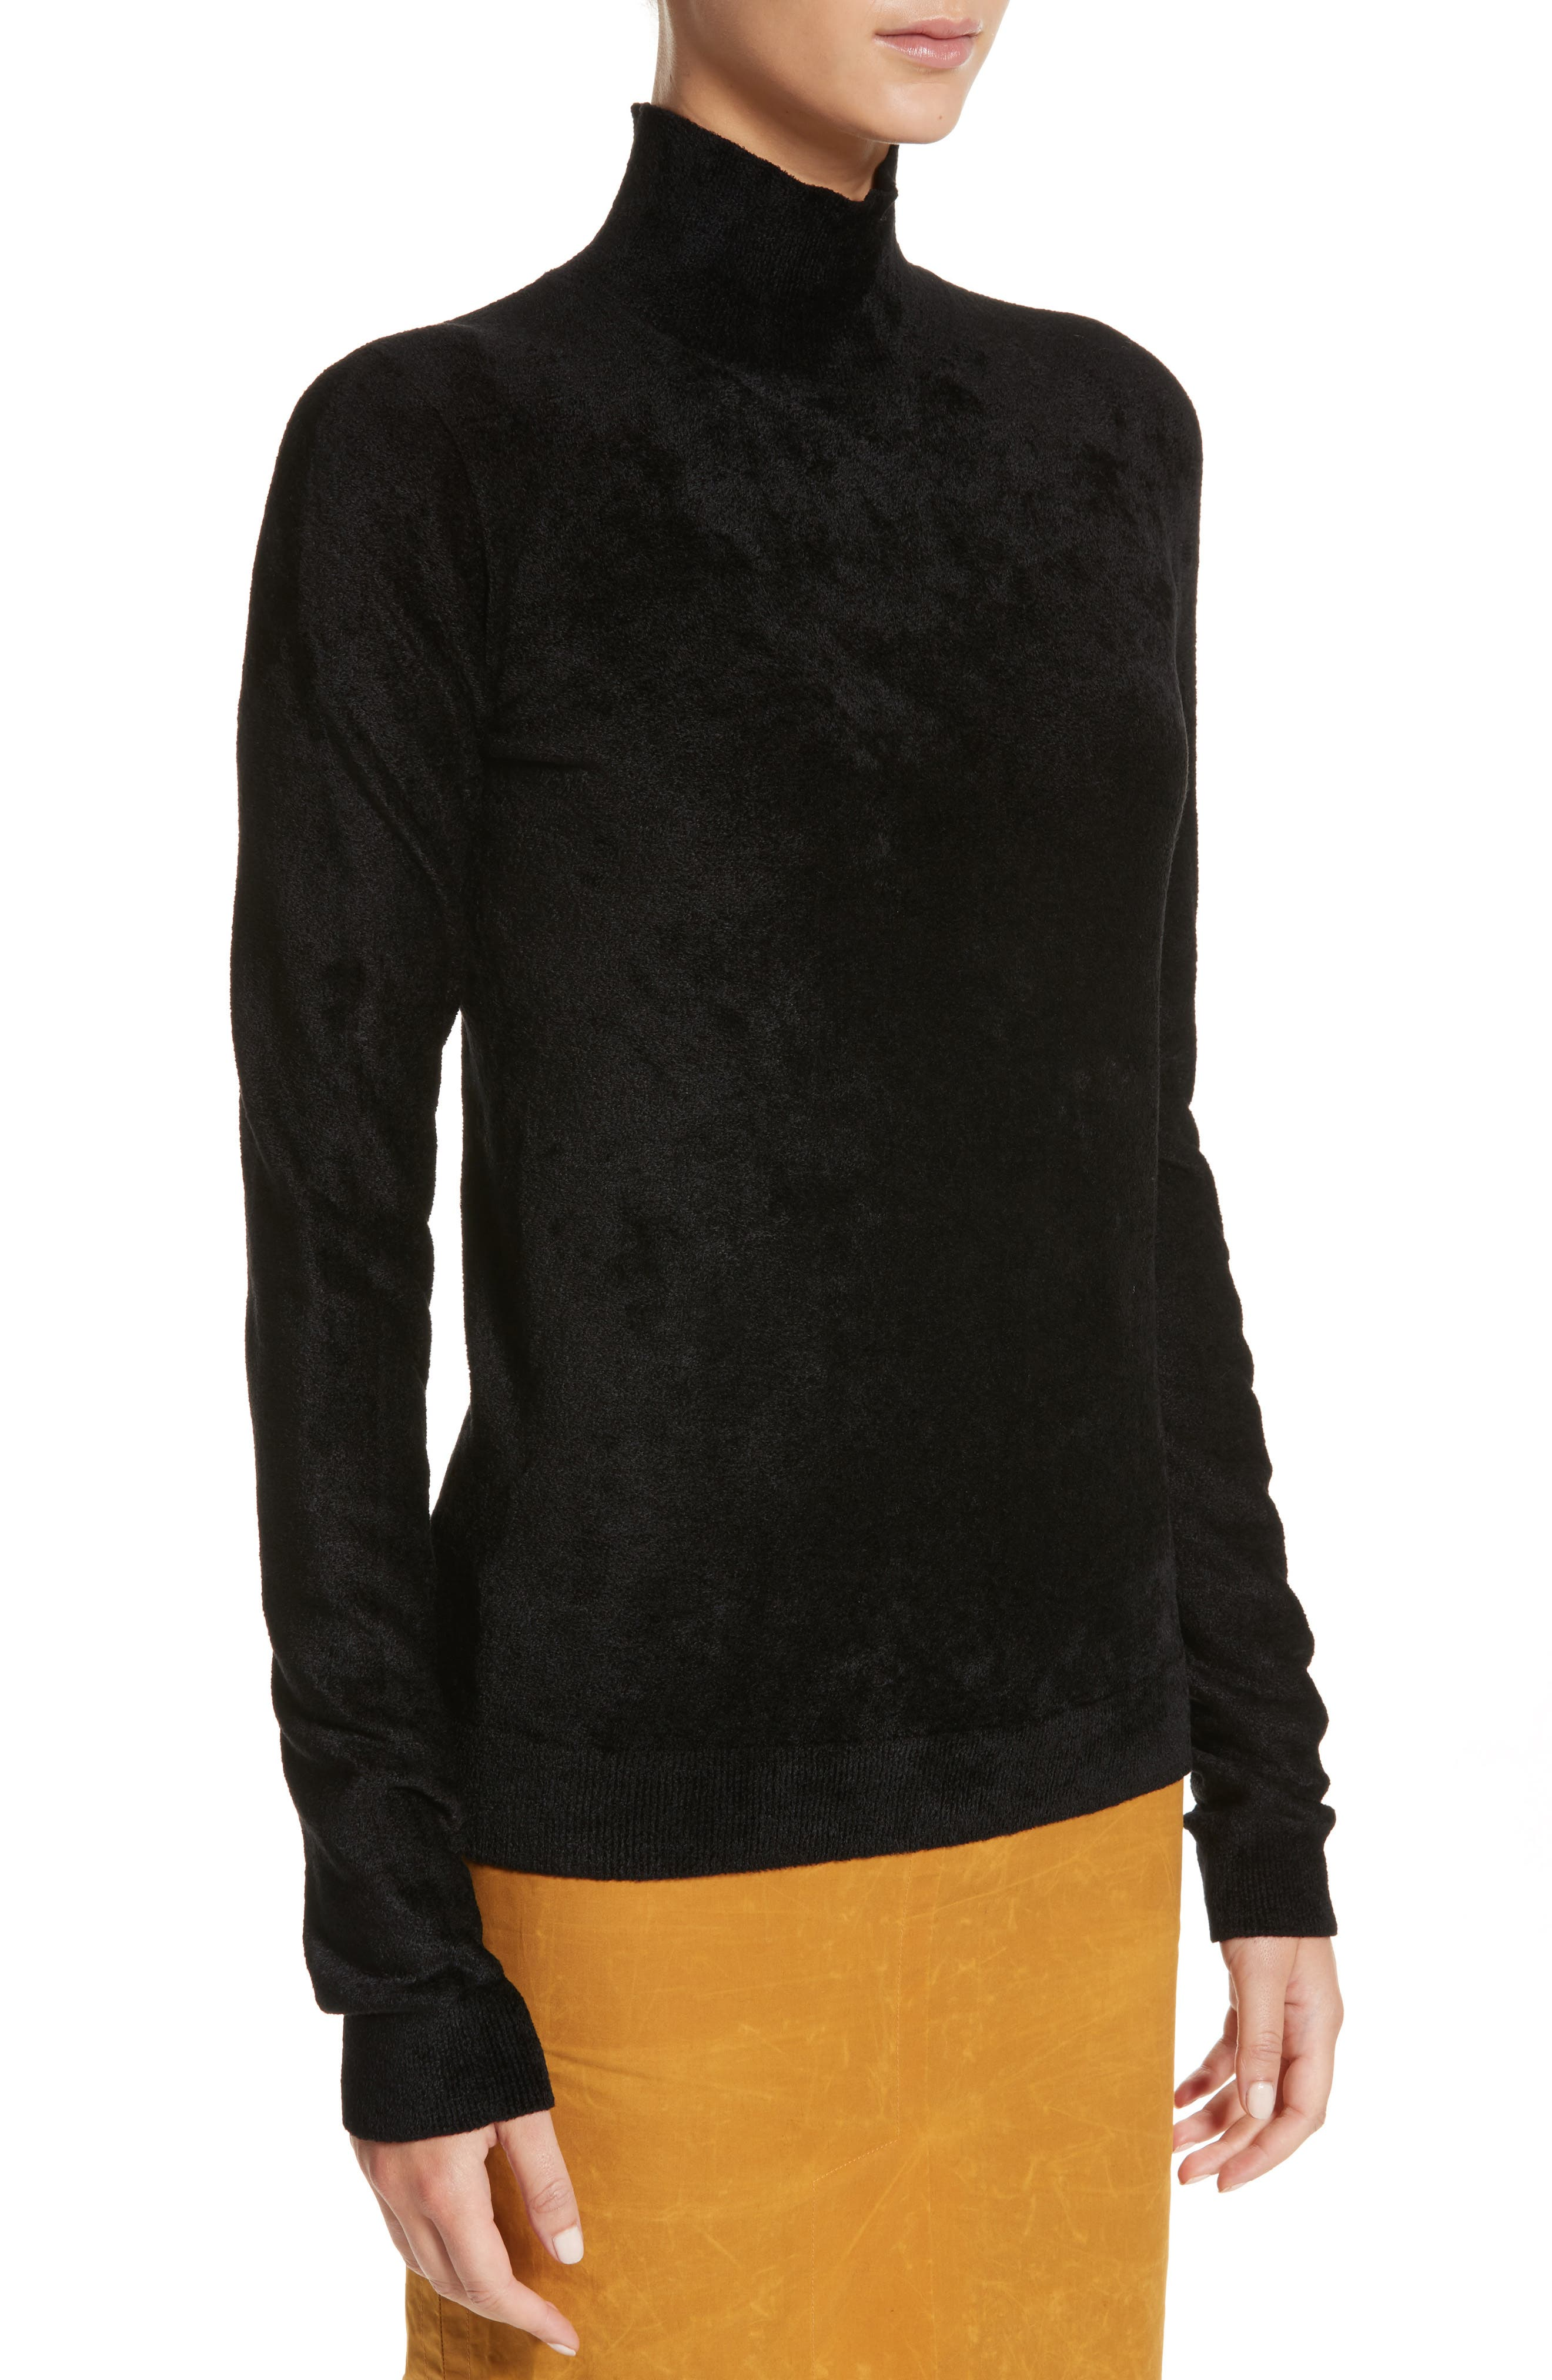 Chenille Turtleneck Sweater,                             Alternate thumbnail 4, color,                             00N99 Black